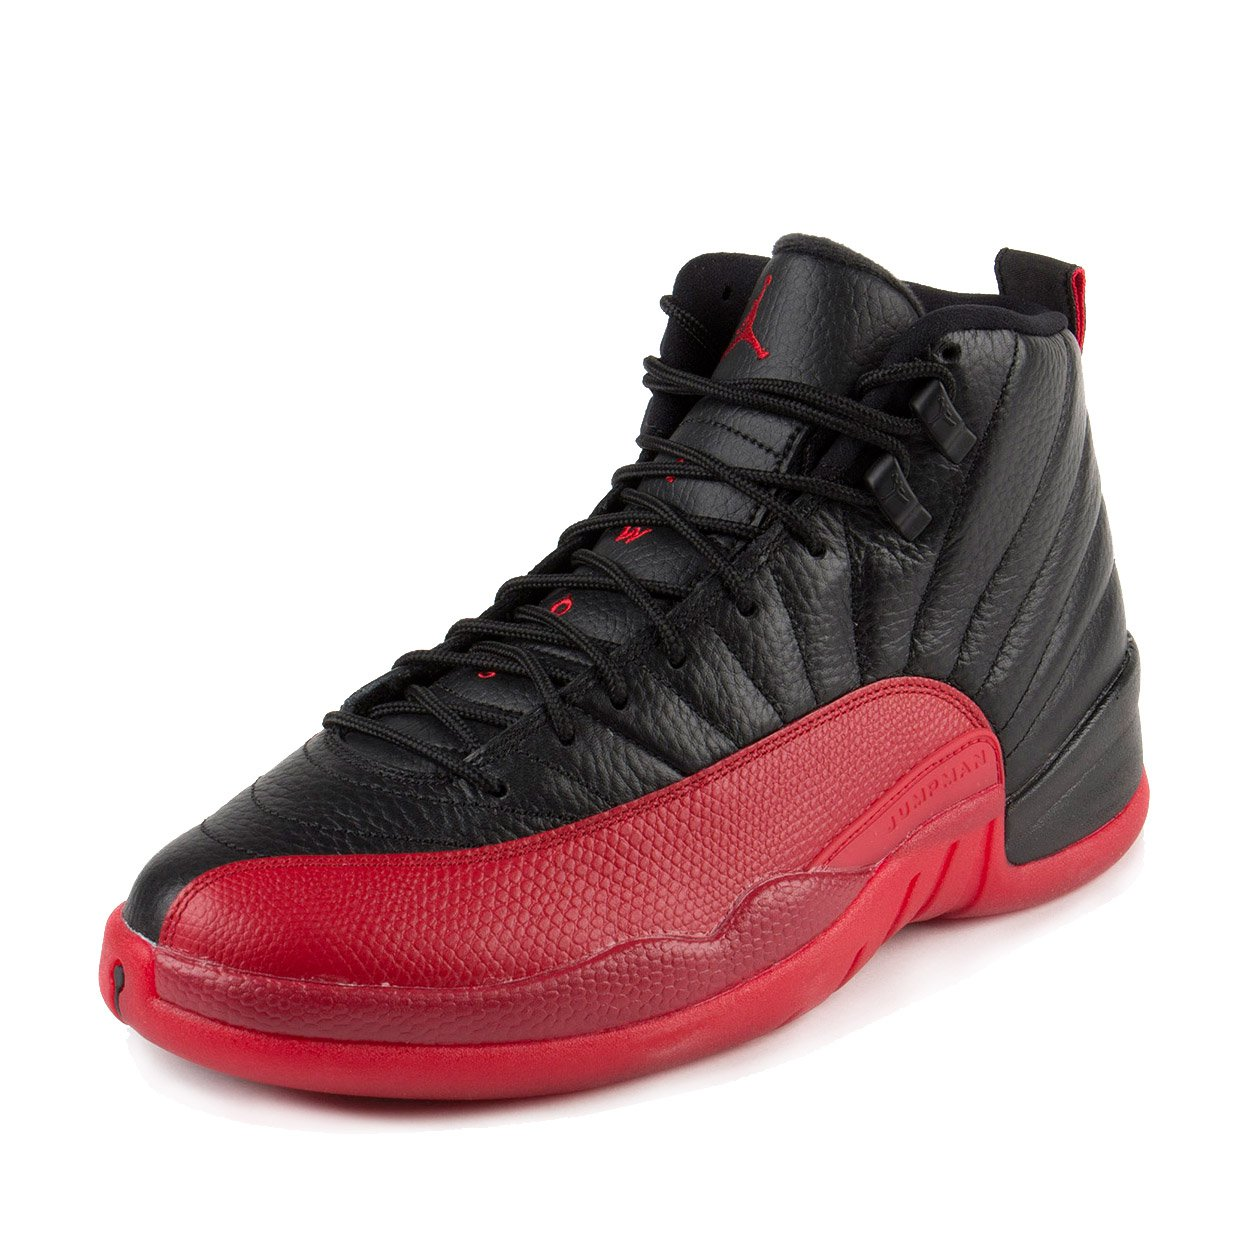 Jordan Nike Mens Air 12 Retro Flu Games Black/Varisty Red Leather Size 11.5 by Jordan